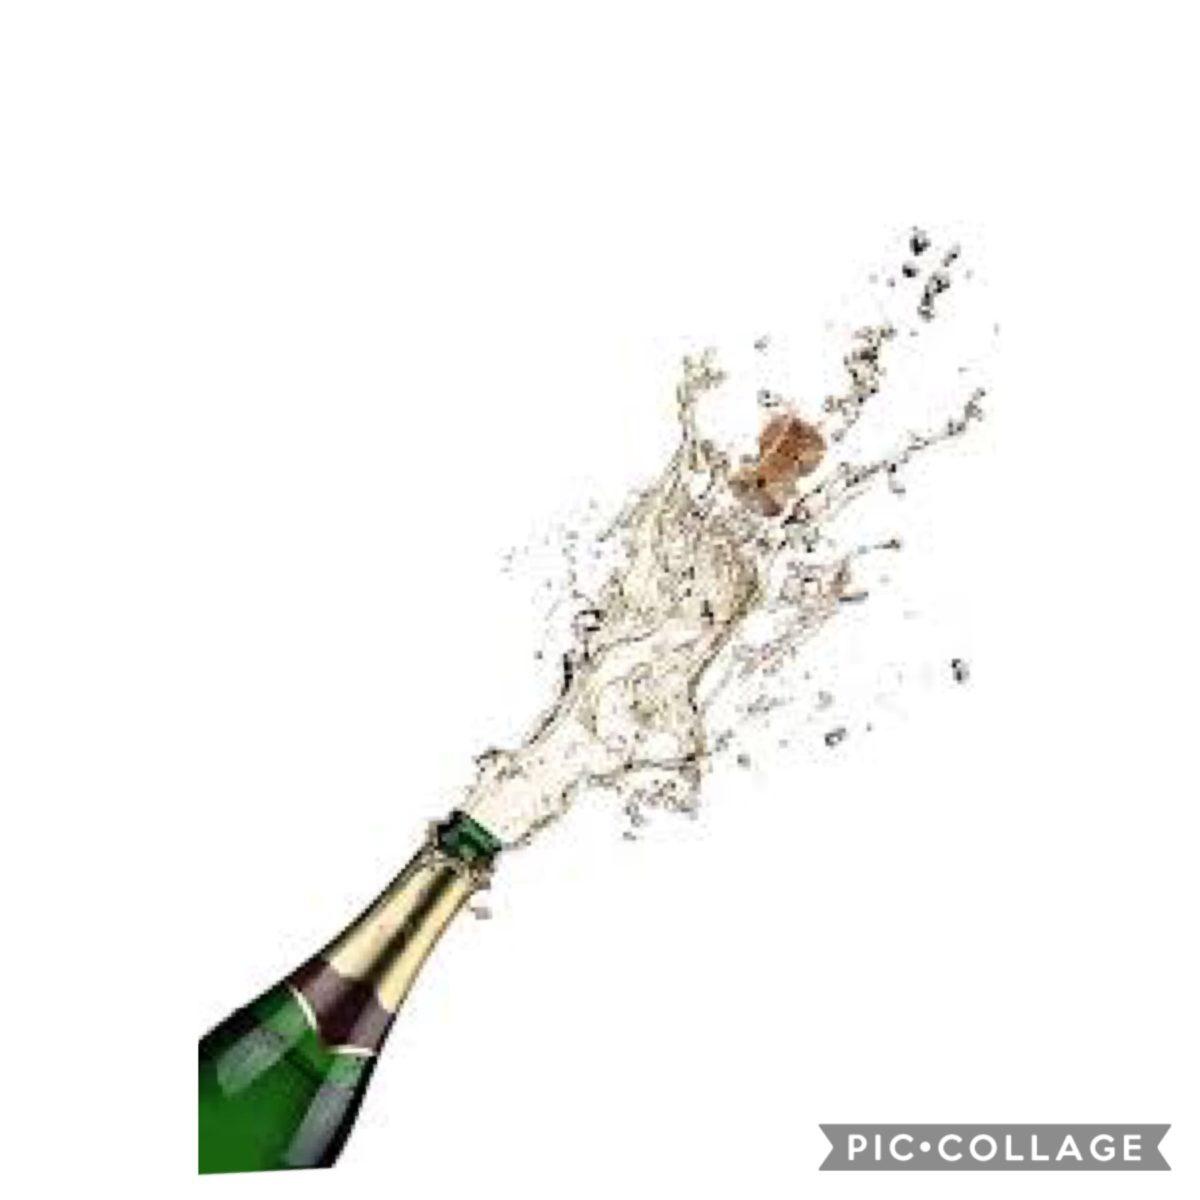 Champagne Sales 2018:  Record High of €4.9 billion